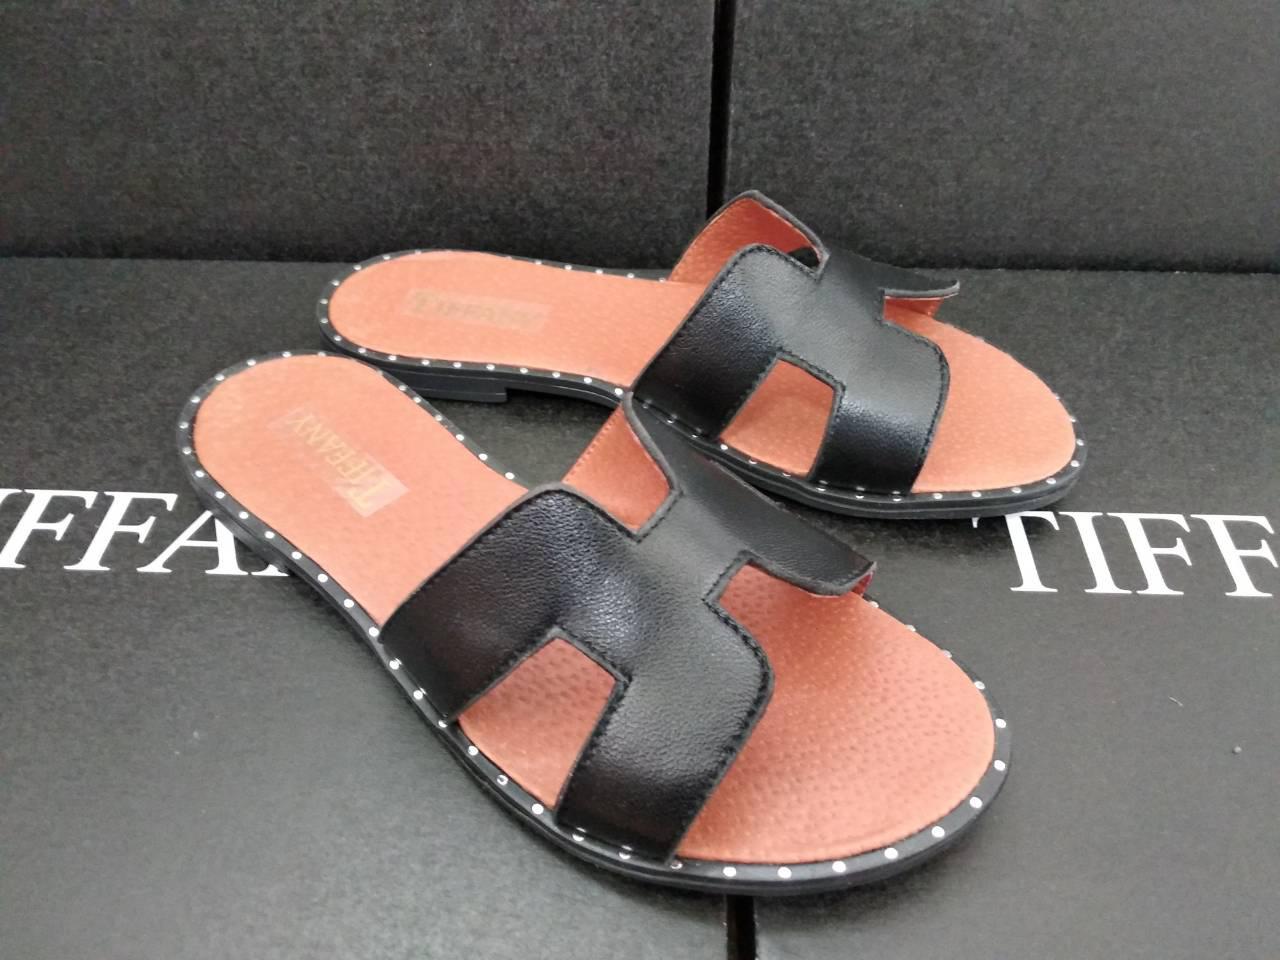 Женские кожаные замшевые шлепки TIFFANY на каблуке низком ходу аналог HERMES  оптом